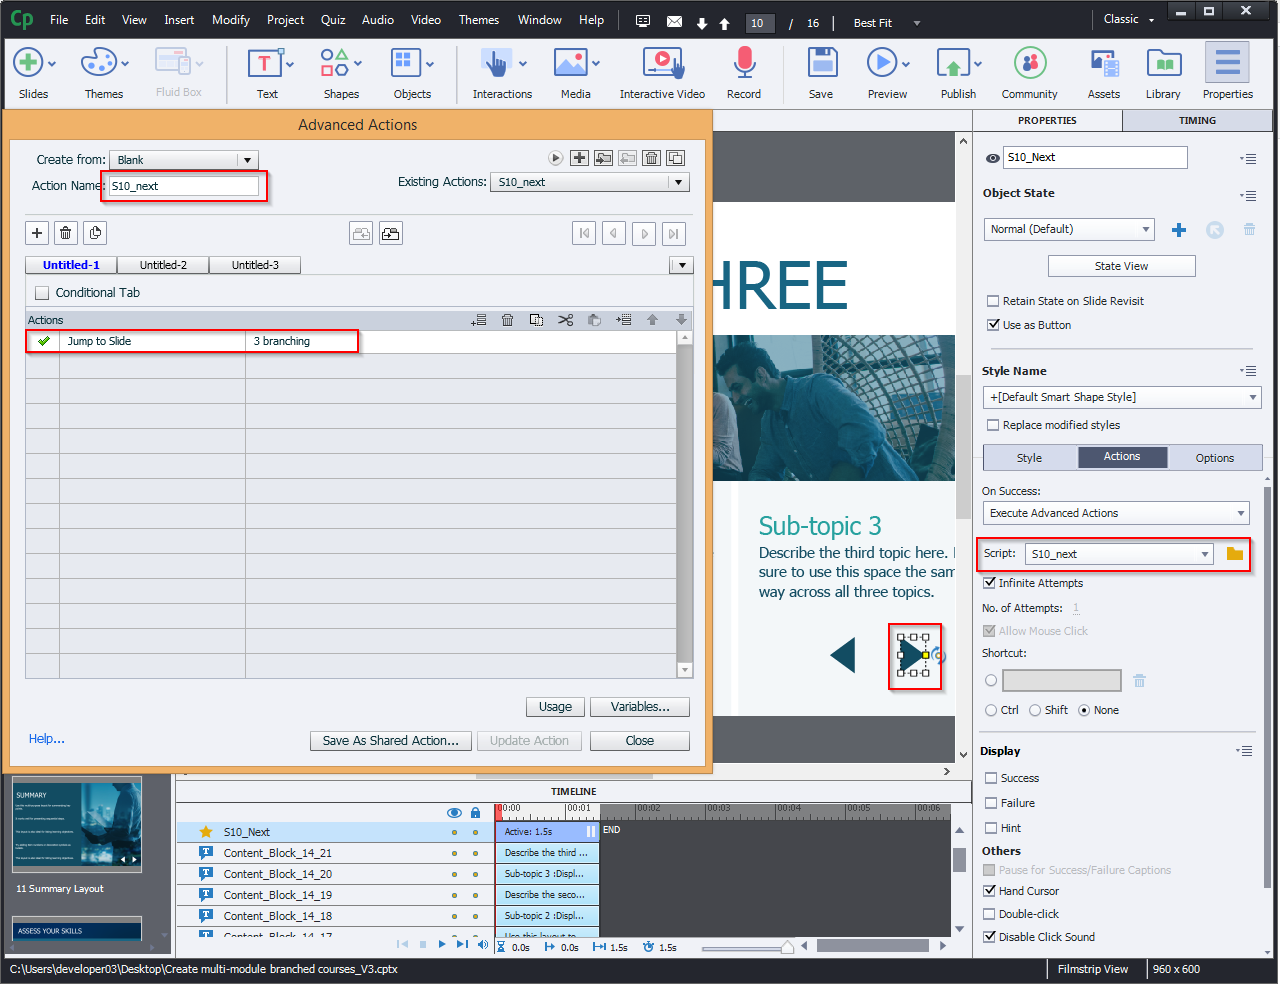 Create multi-module branched courses 12.2